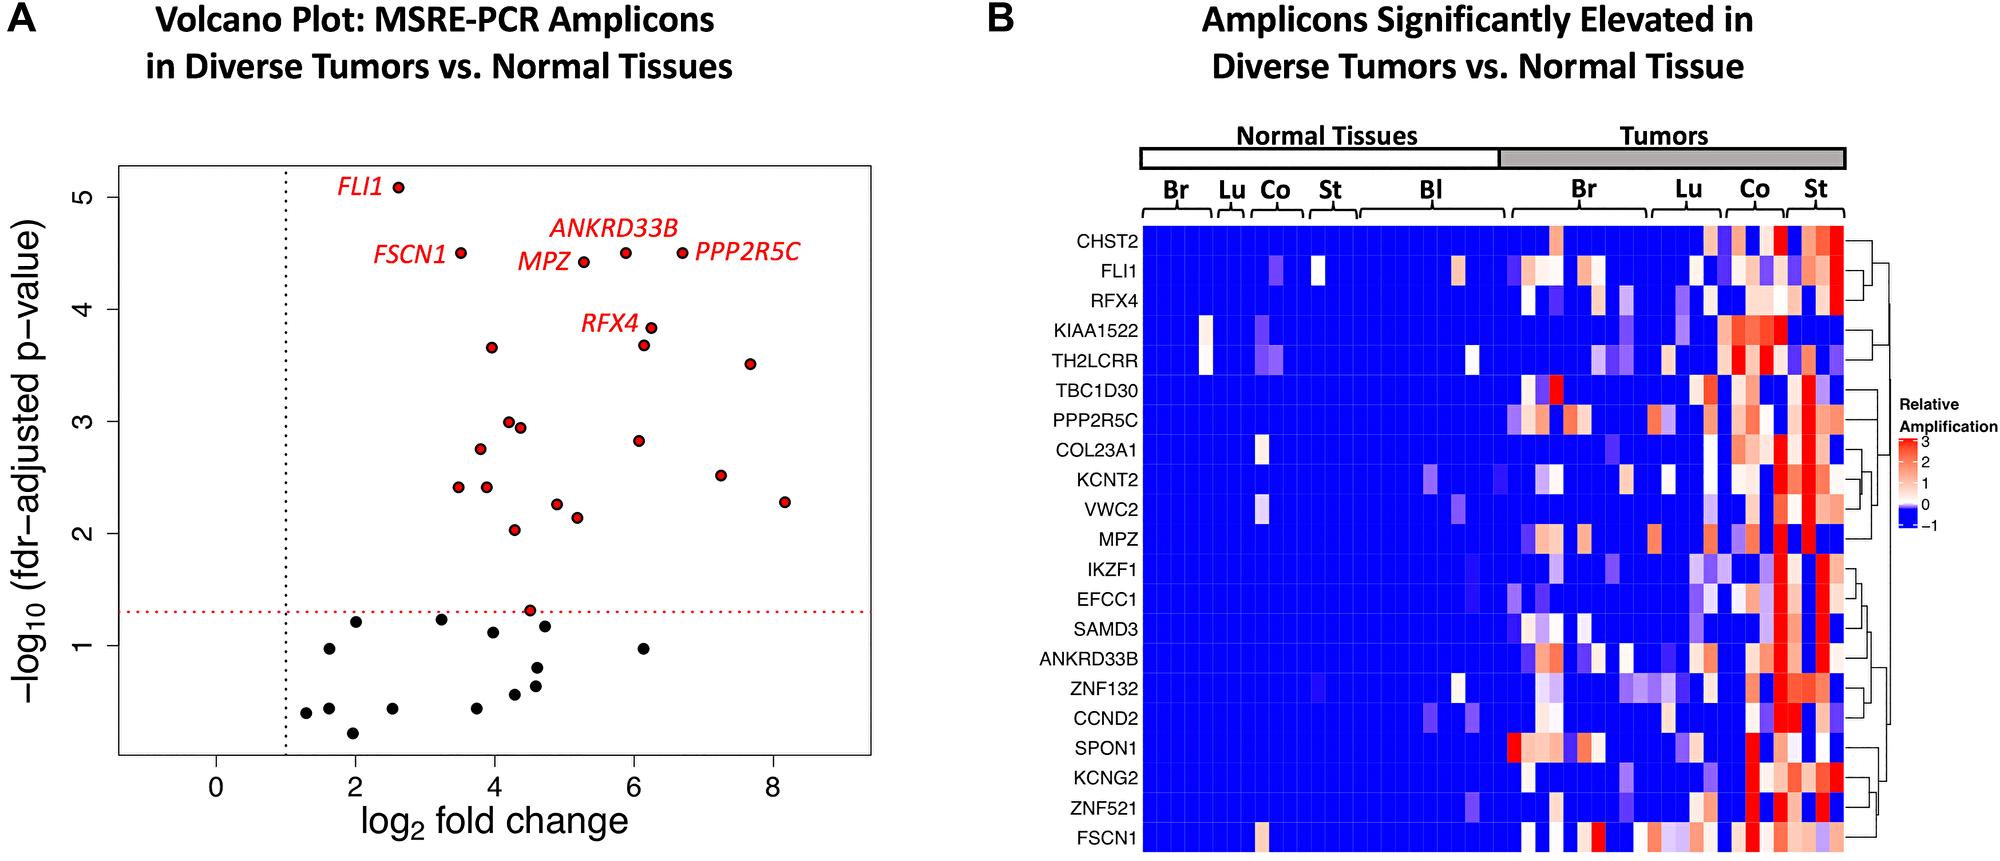 Multiplexed MSRE-PCR of the target regions in genomic DNAs from diverse tumors versus normal tissue.